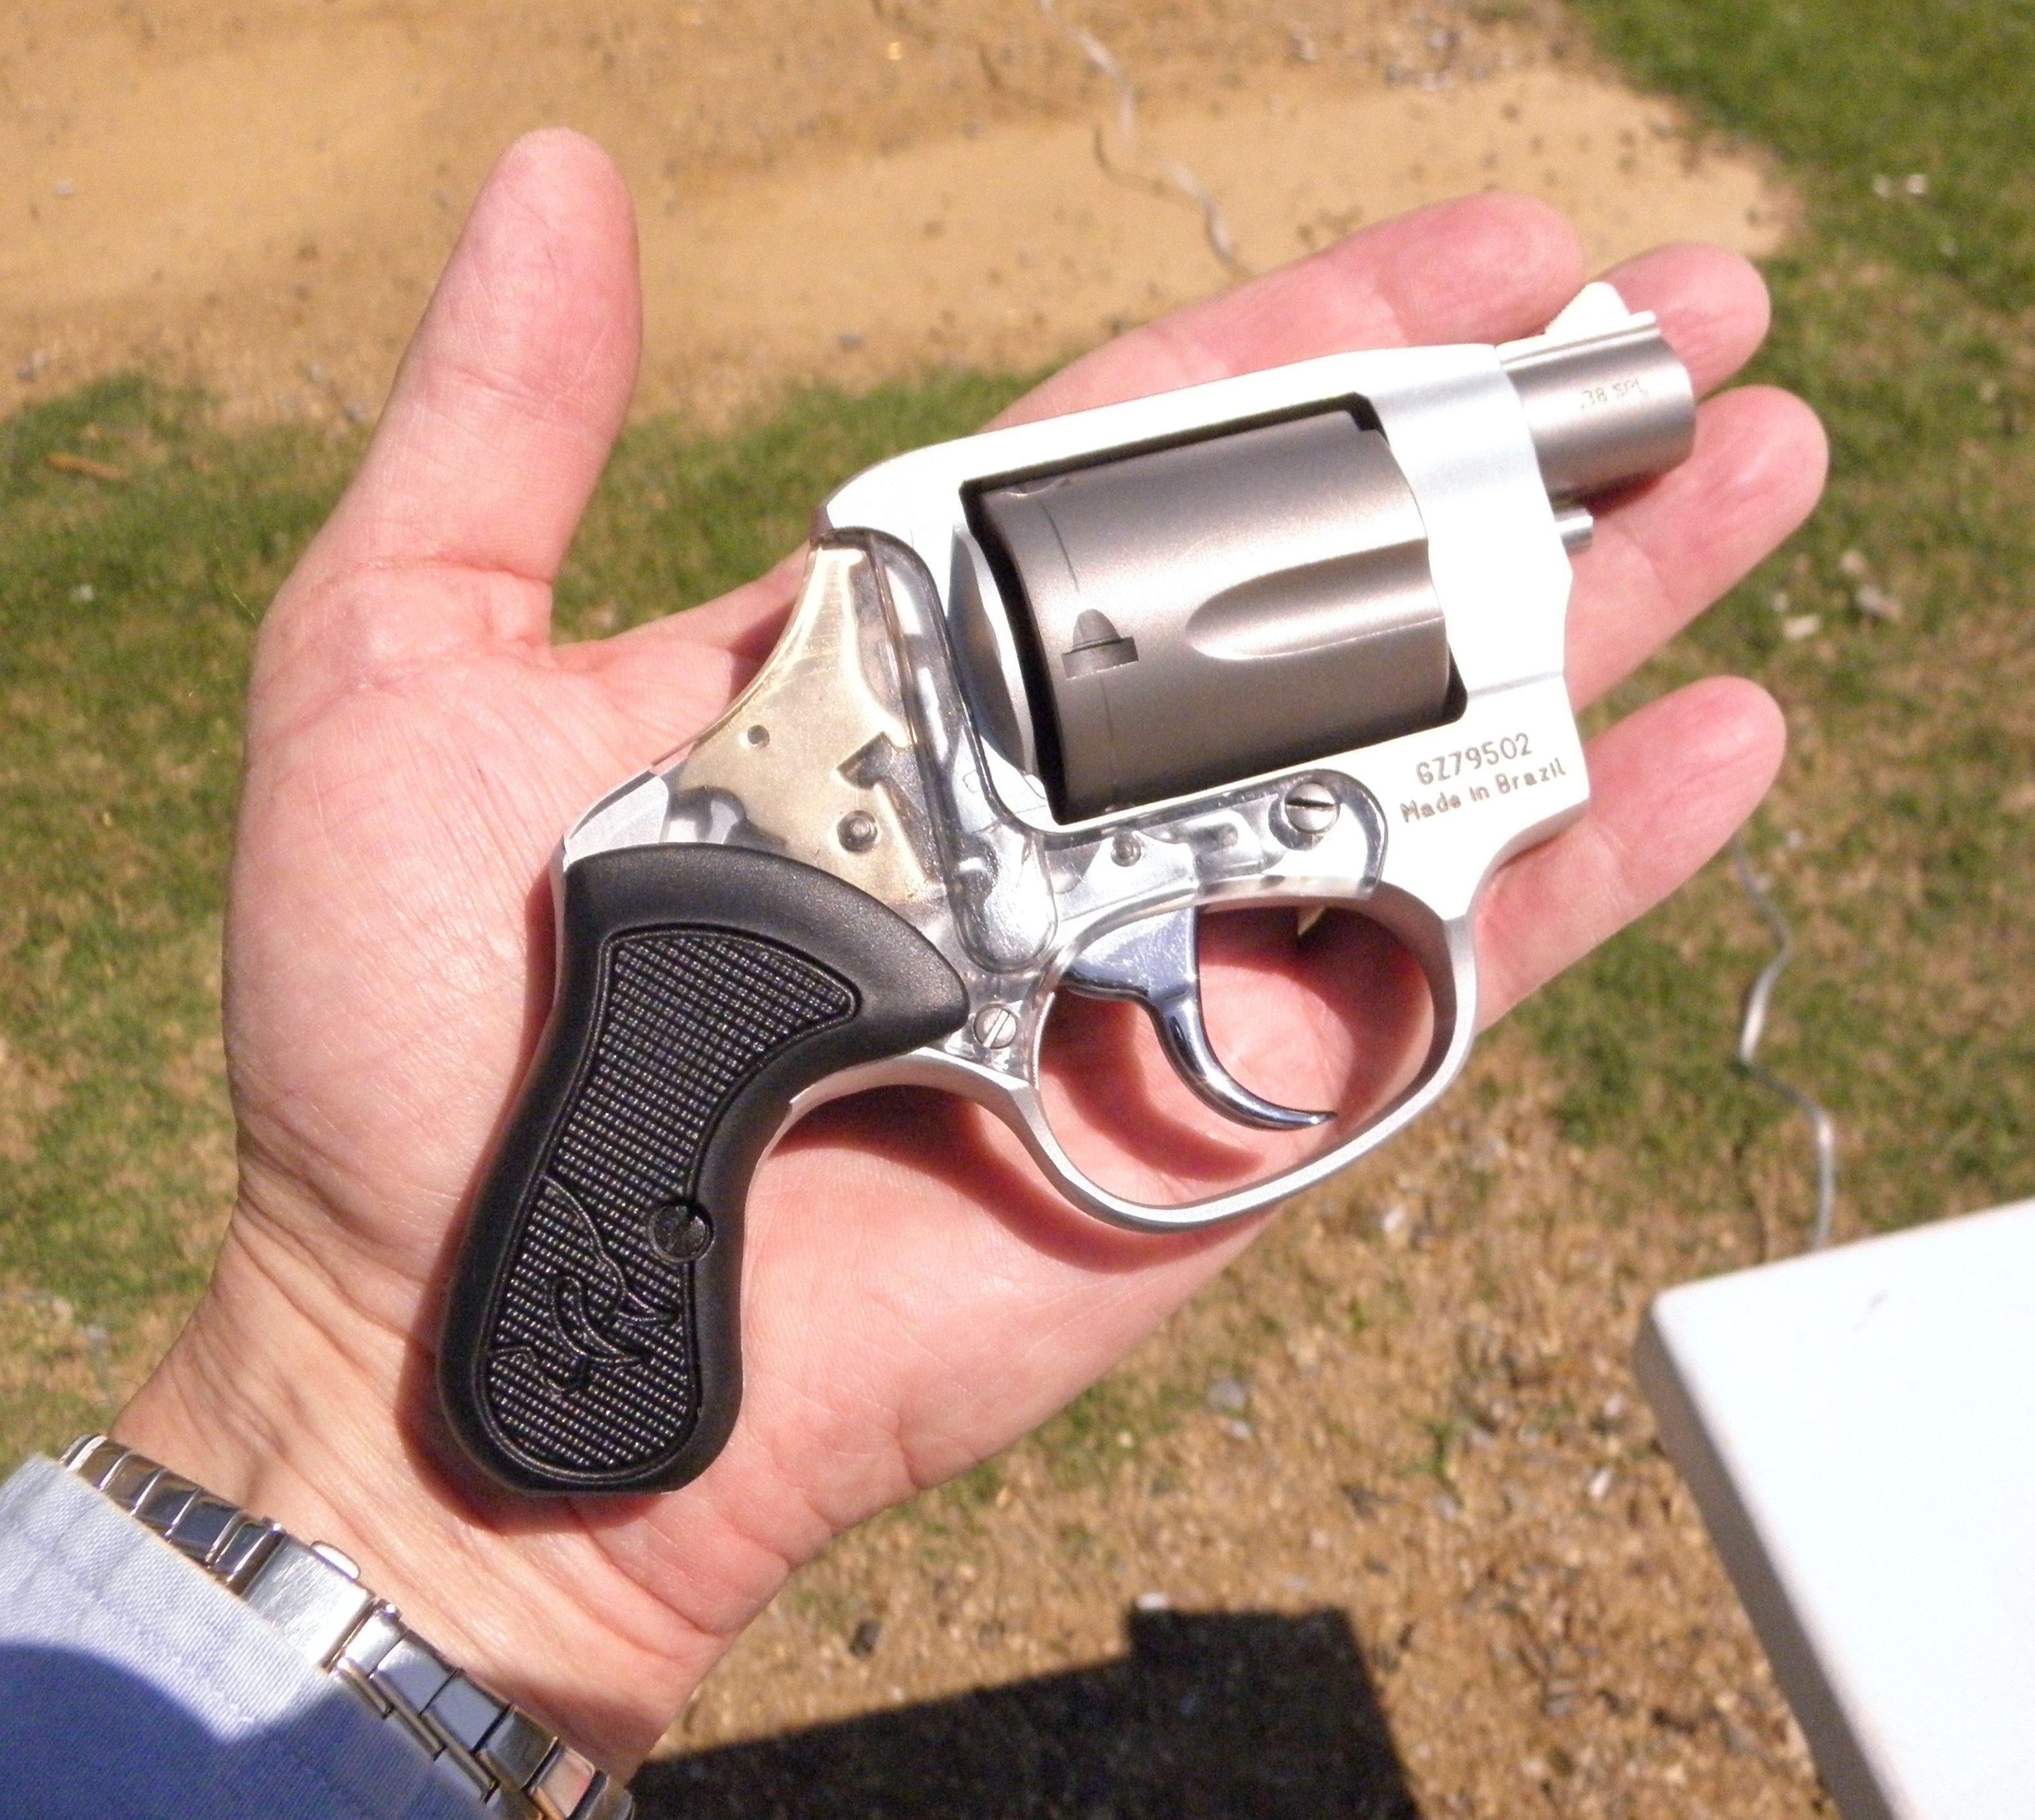 Taurus View - Light, Pocketable Titanium & Lexan Revolver —New Gun